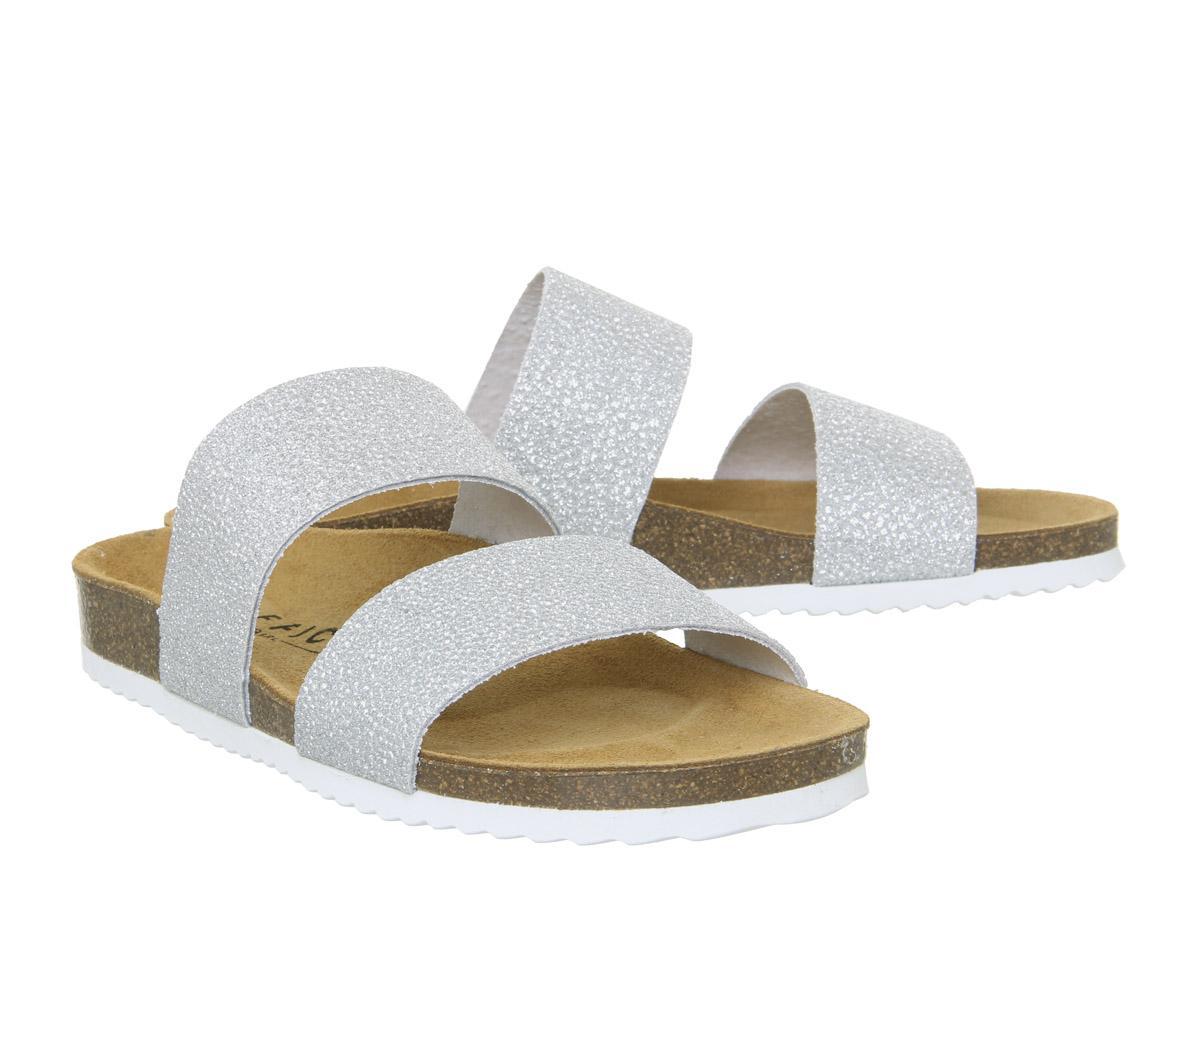 Womens Office Oslo 2 Sandals New Silver Glitter Sandals